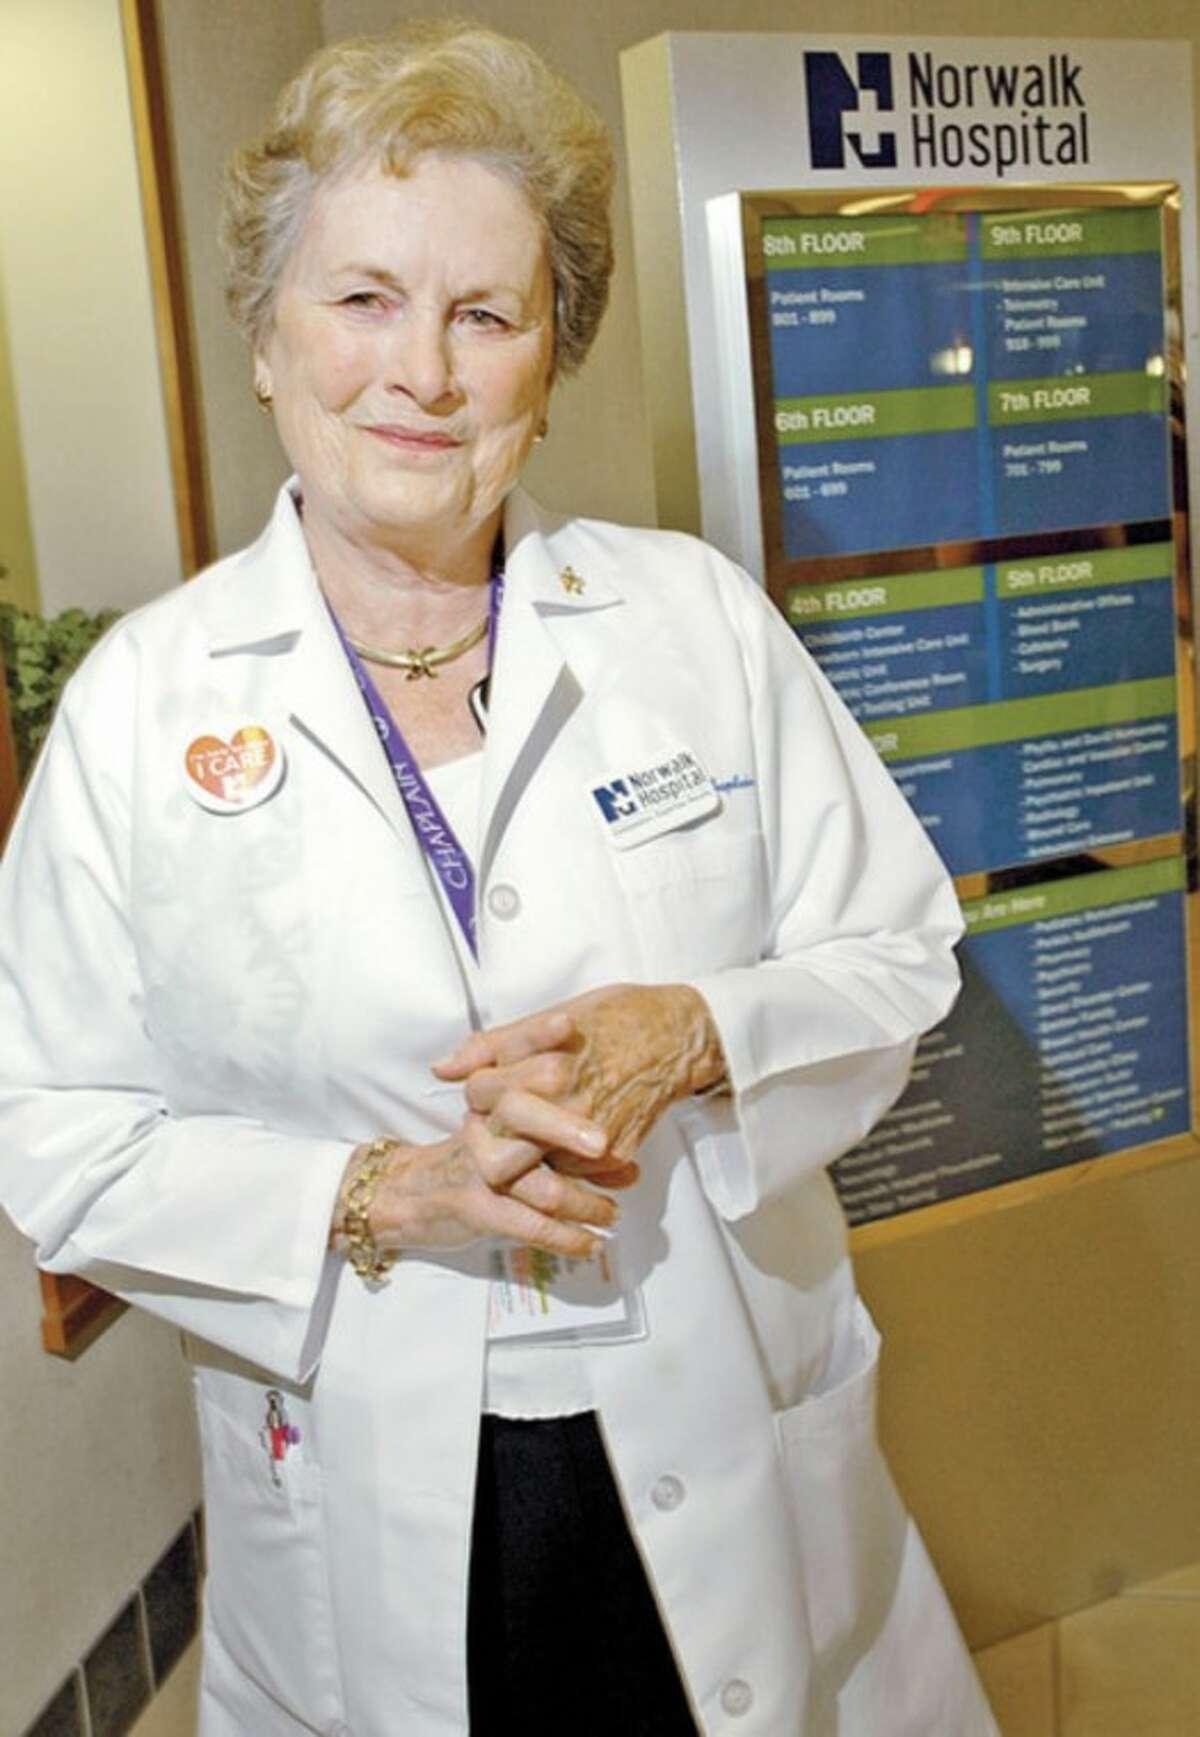 Hour photo / Erik Trautmann Norwalk Hospital chaplain and philanthropist Carol Bauer receives Connecticut Hospital Association 2012 Healthcare Hero Award.